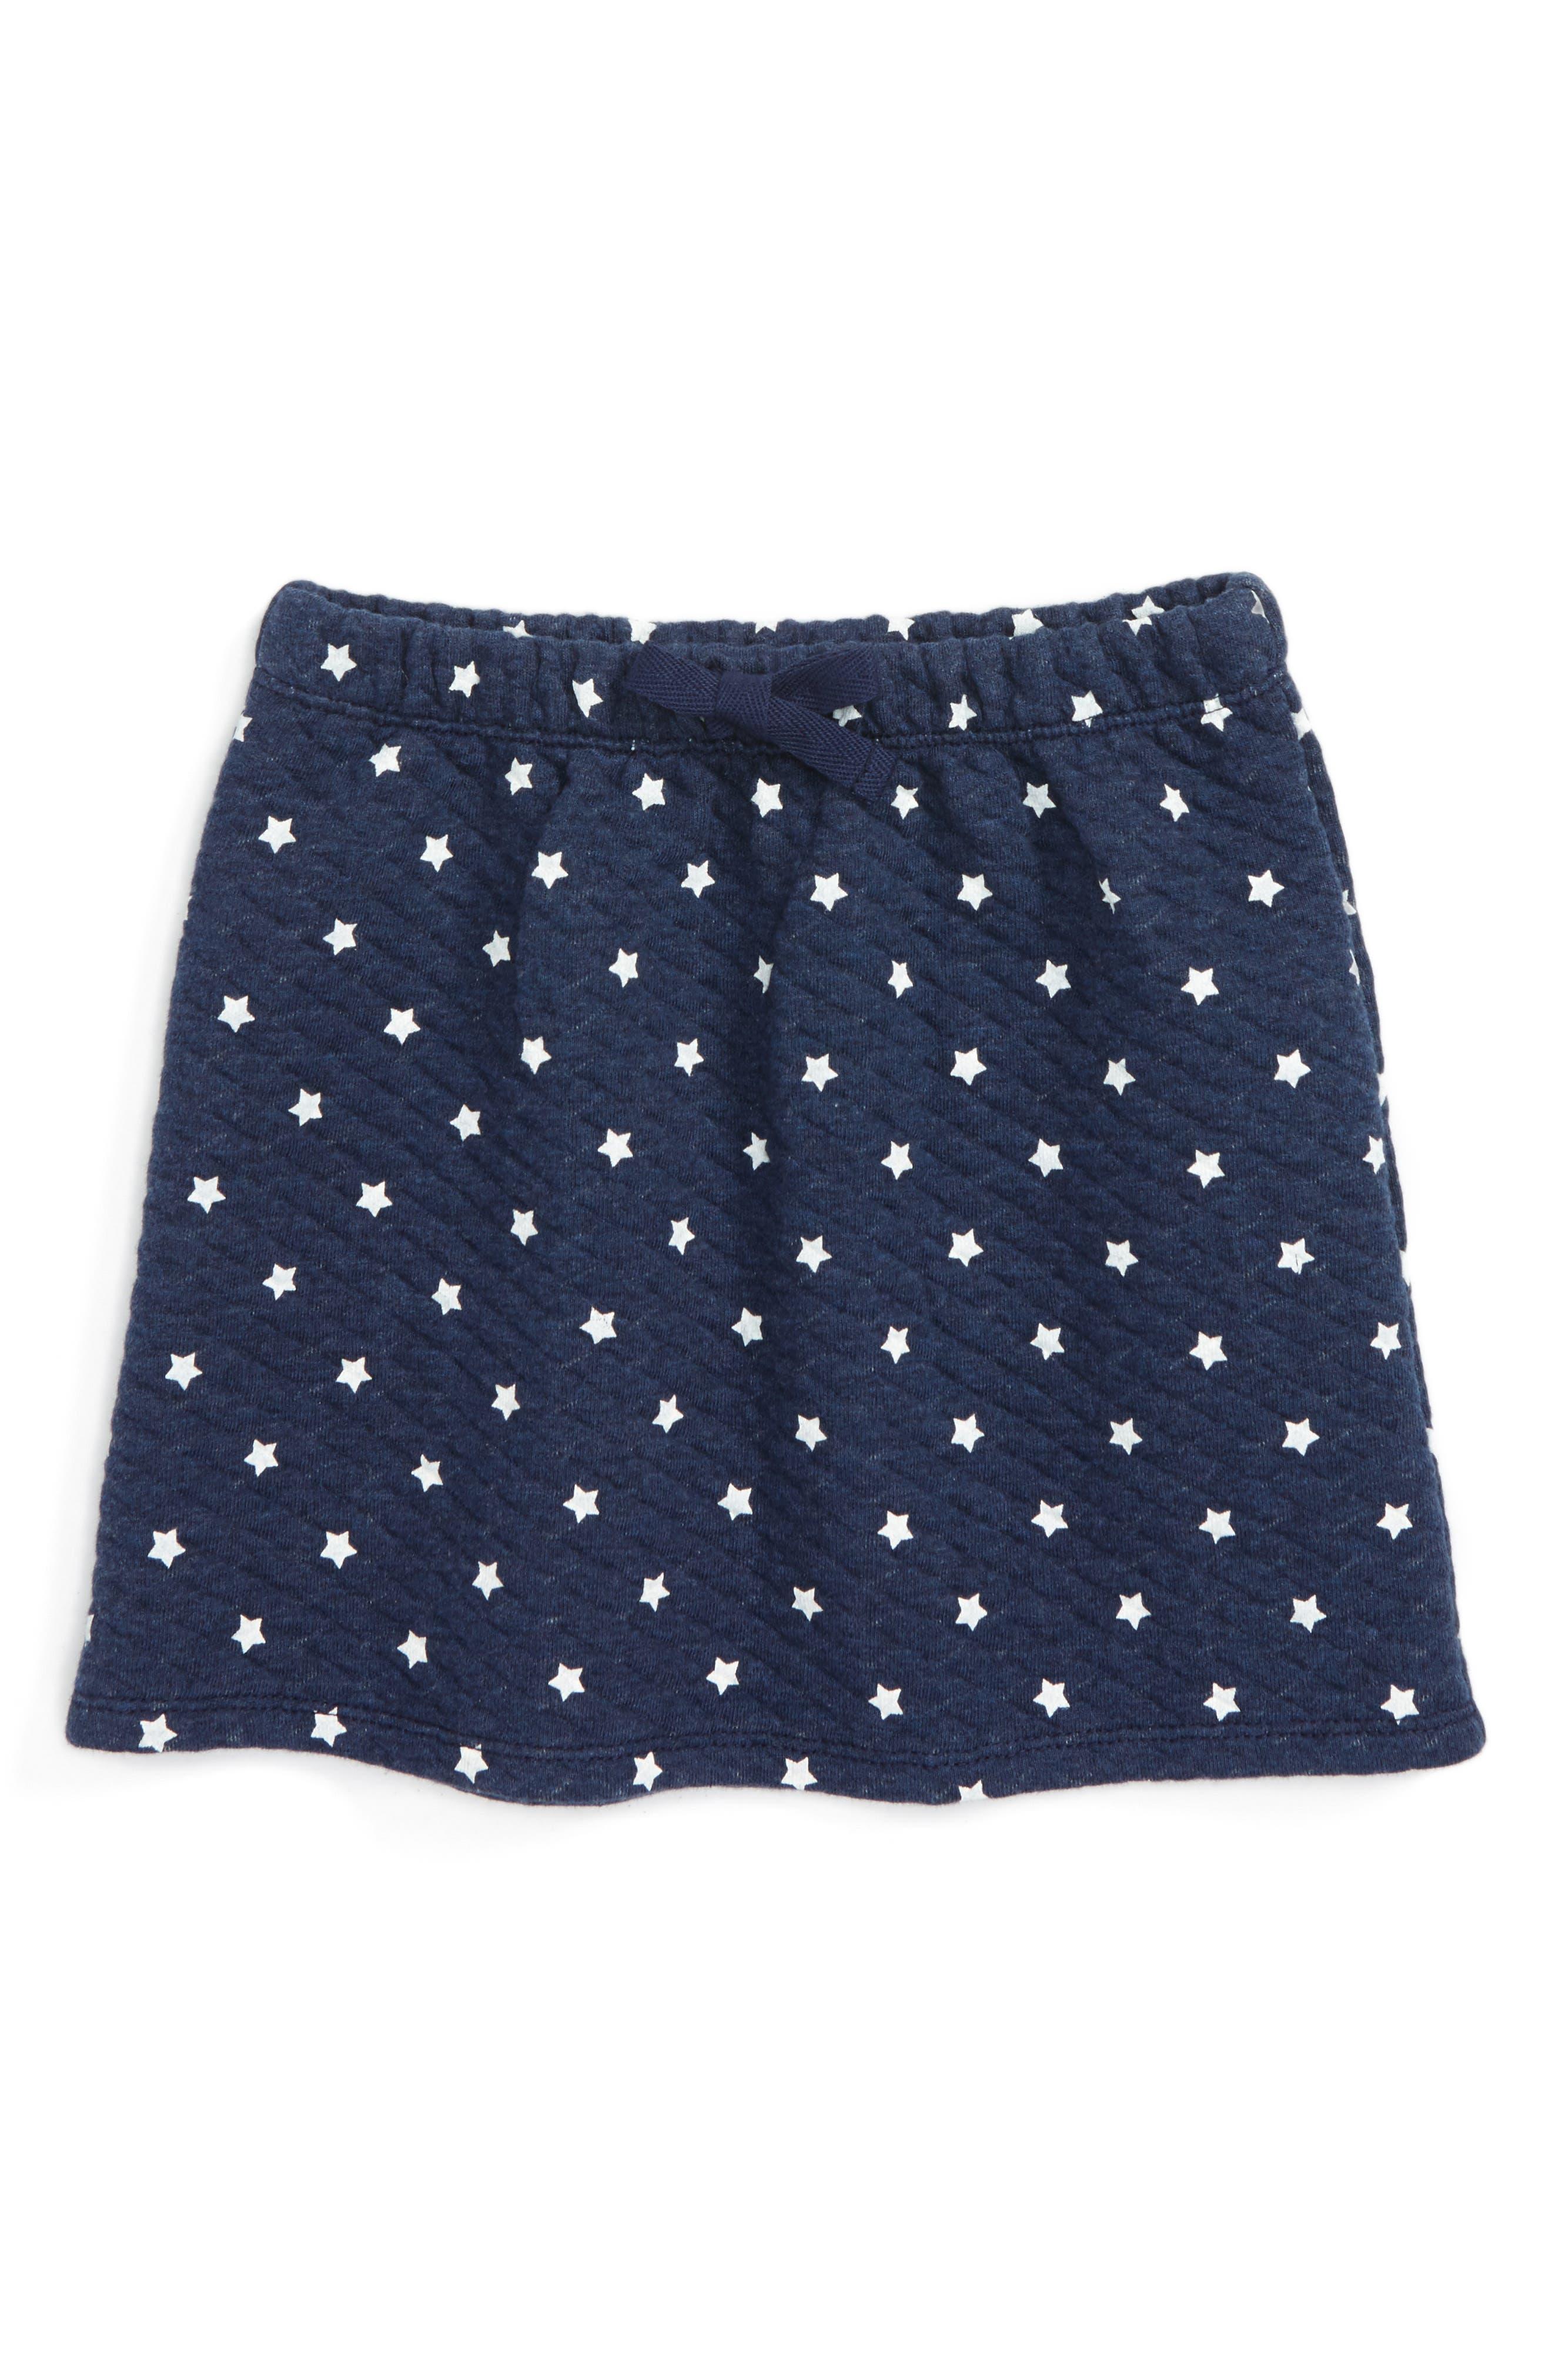 Thea Star Skirt,                             Main thumbnail 1, color,                             Navy Peacoat Heather Stars